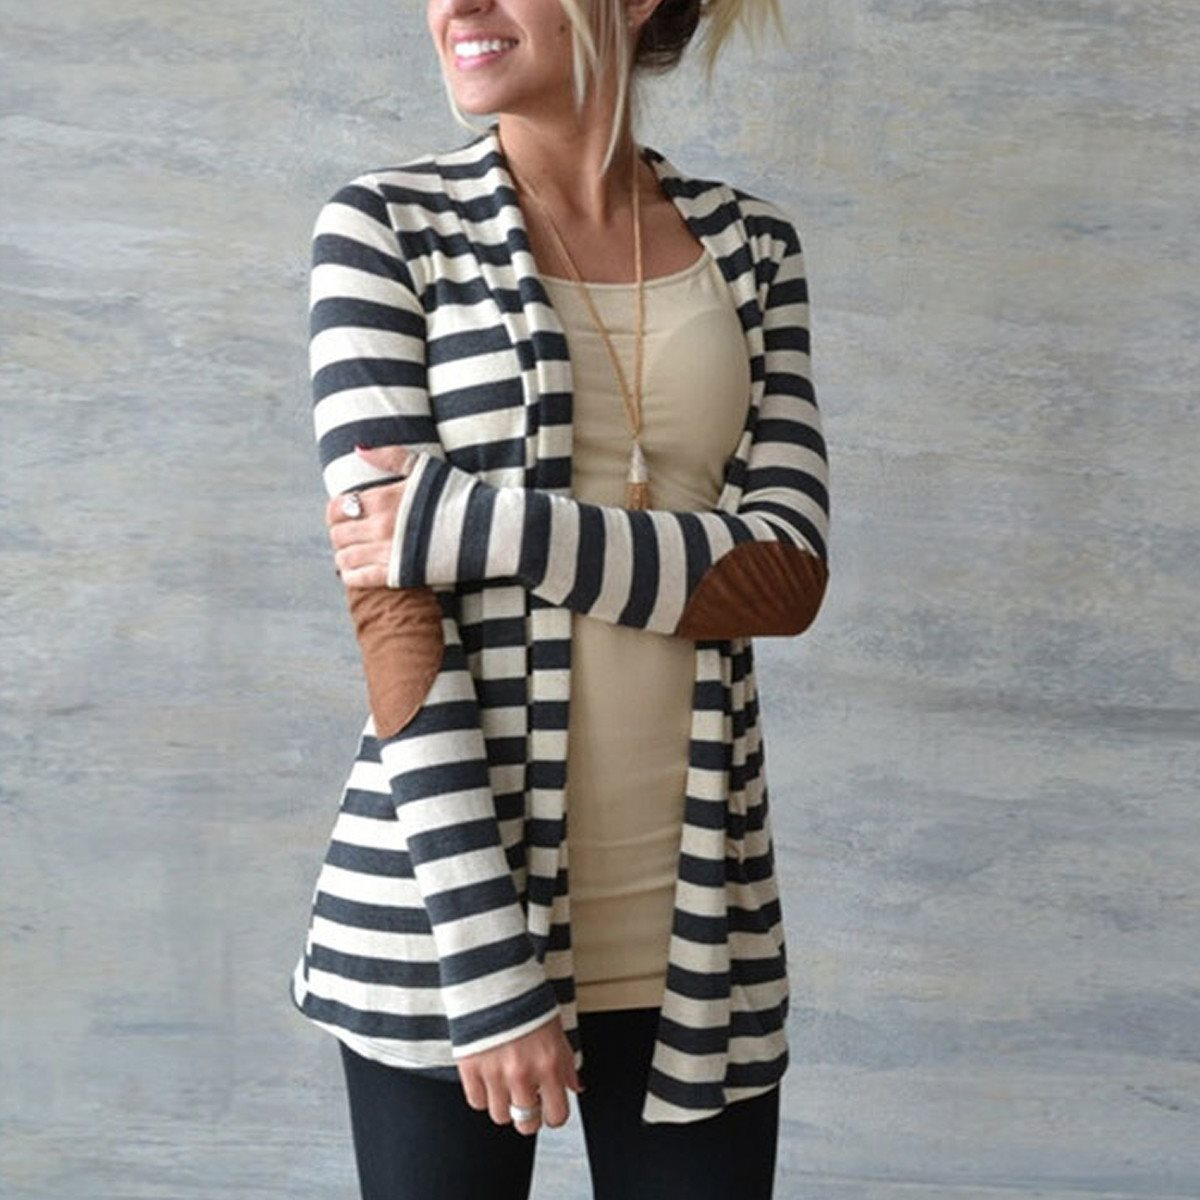 ZANZEA moda 2018 otoño prendas de vestir exteriores mujer manga larga a rayas impreso Cardigan Casual codo Patchwork punto suéter talla grande